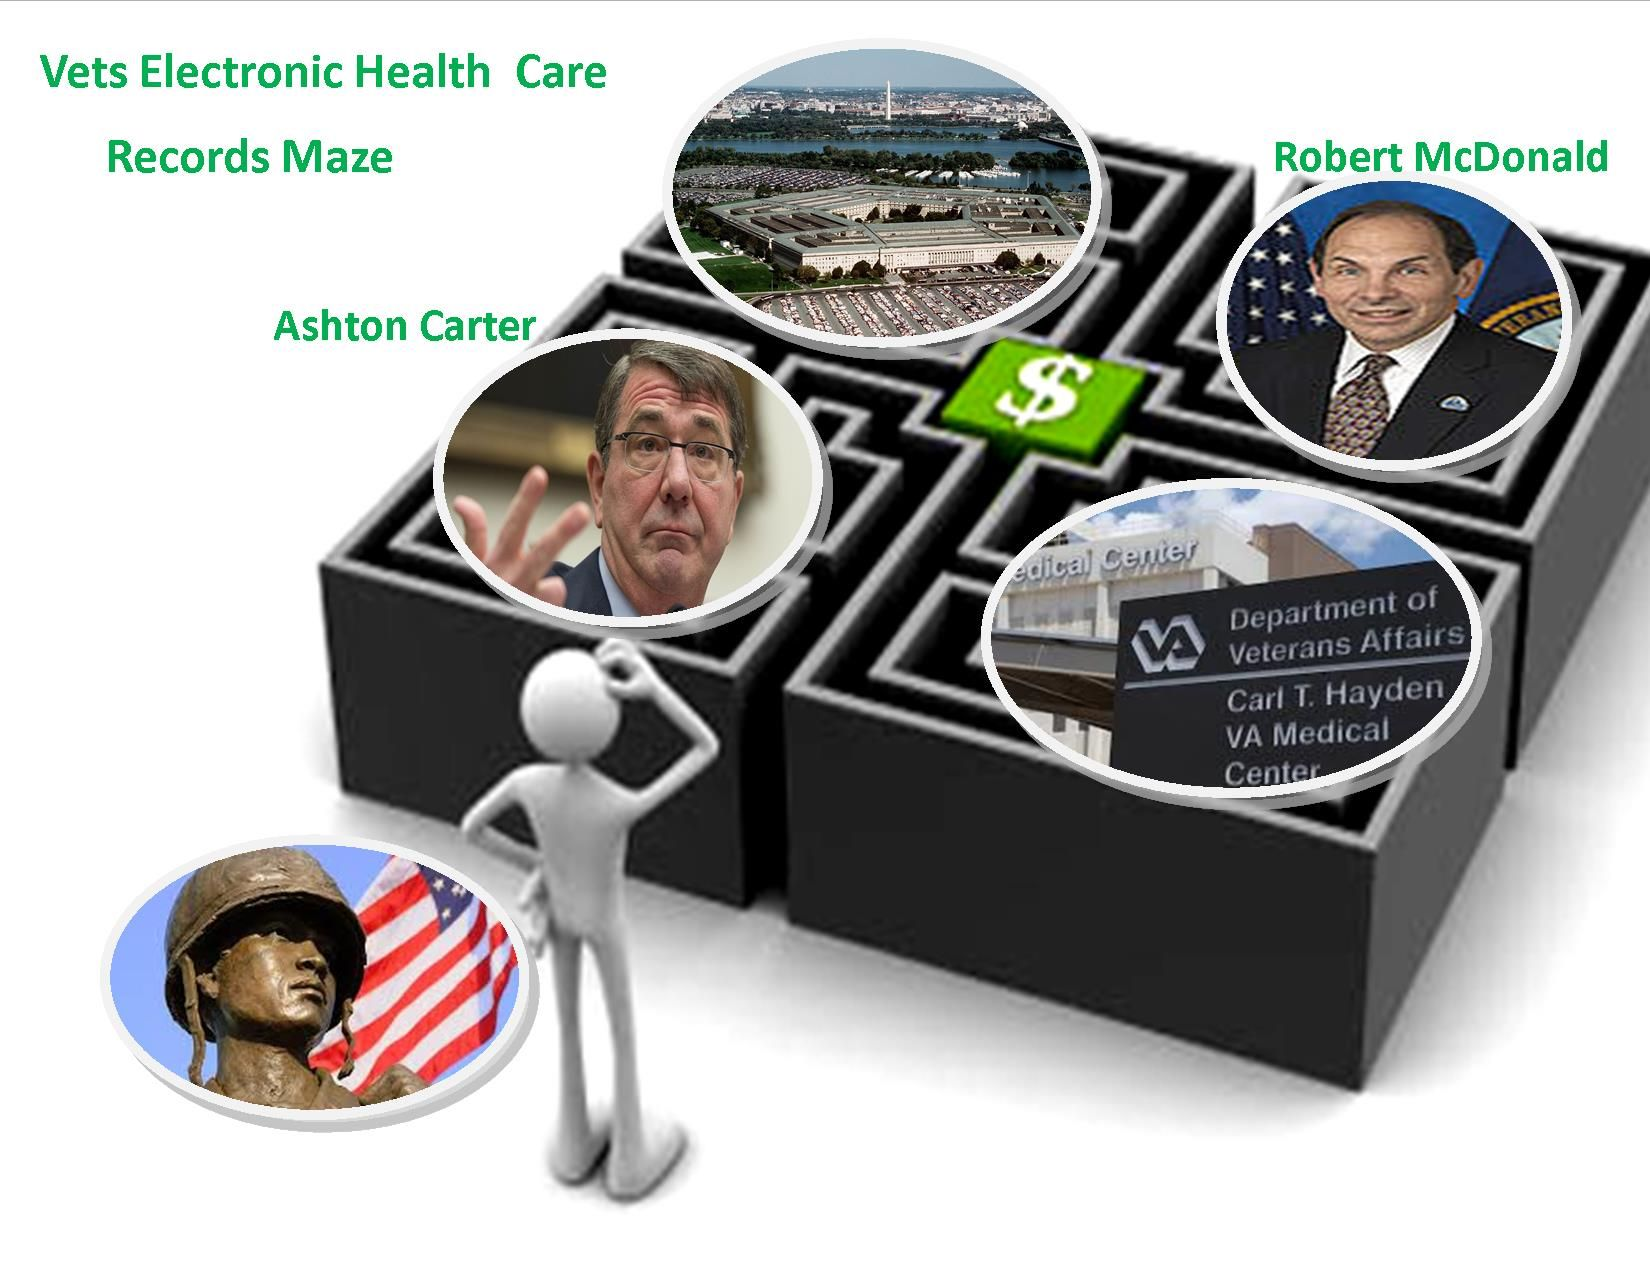 Pentagon Va Struggle With Military Electronic Health Care